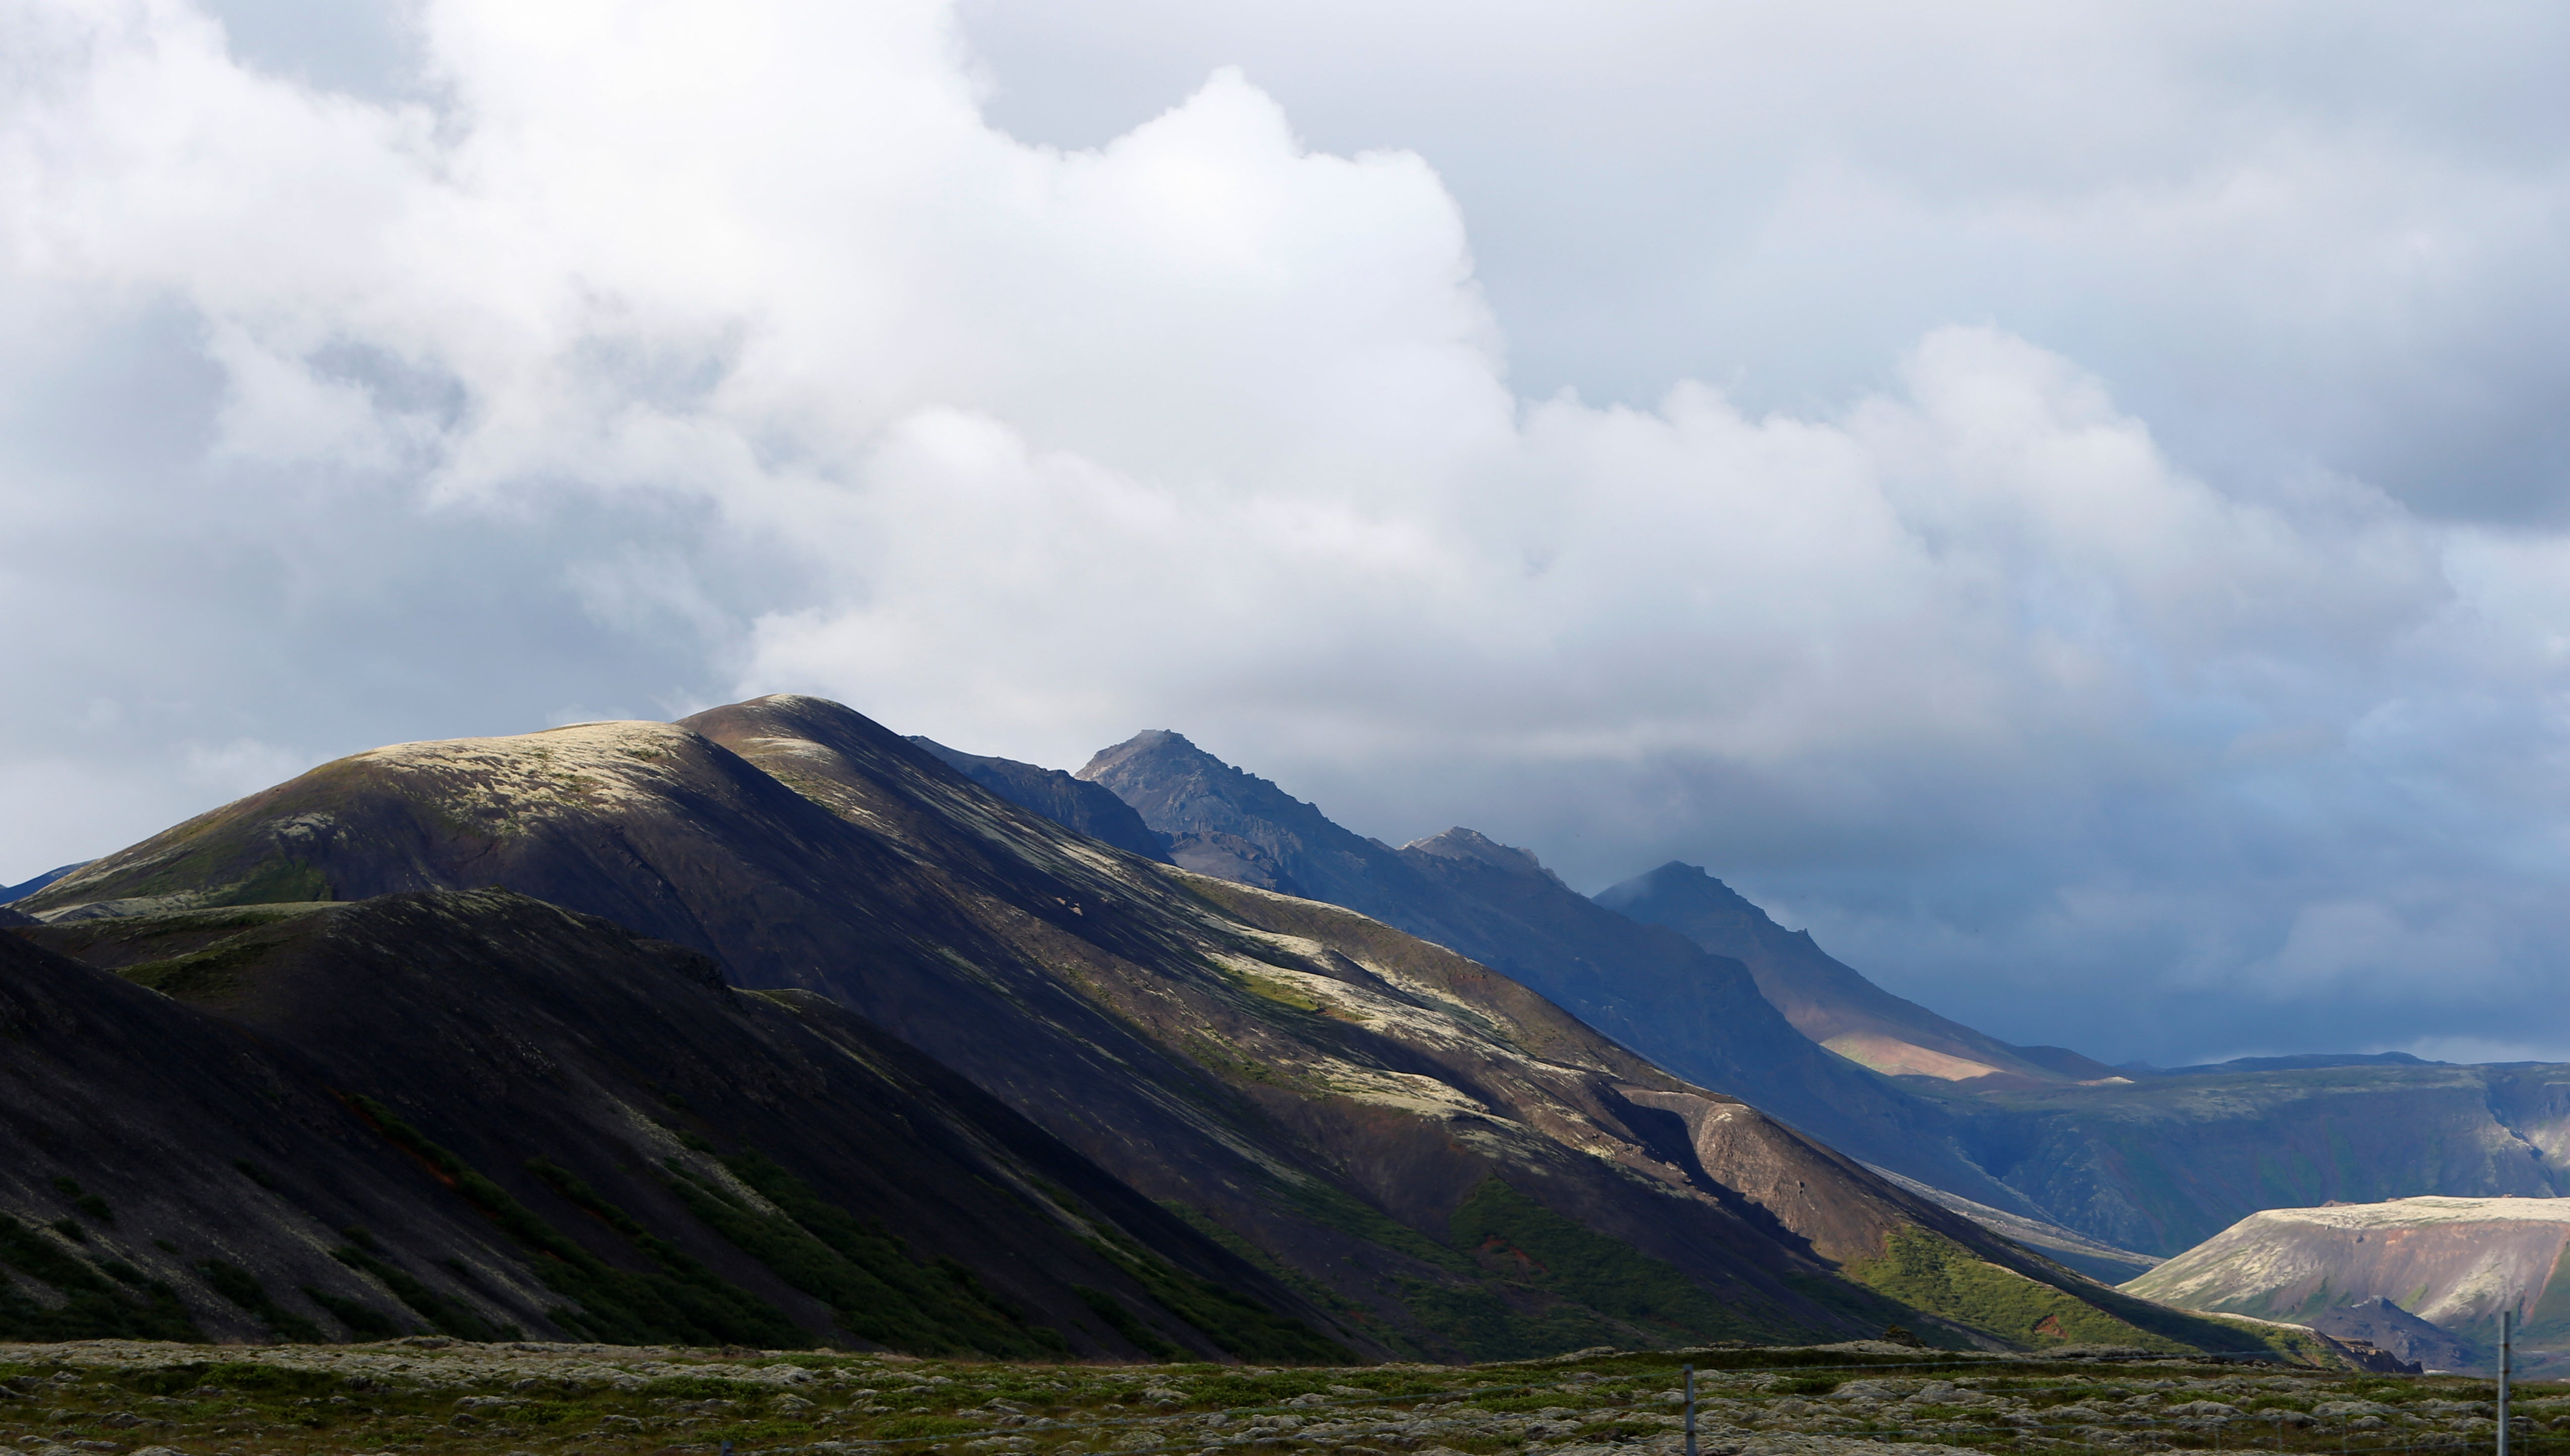 The rugged Icelandic landscape outside Reykjavic.